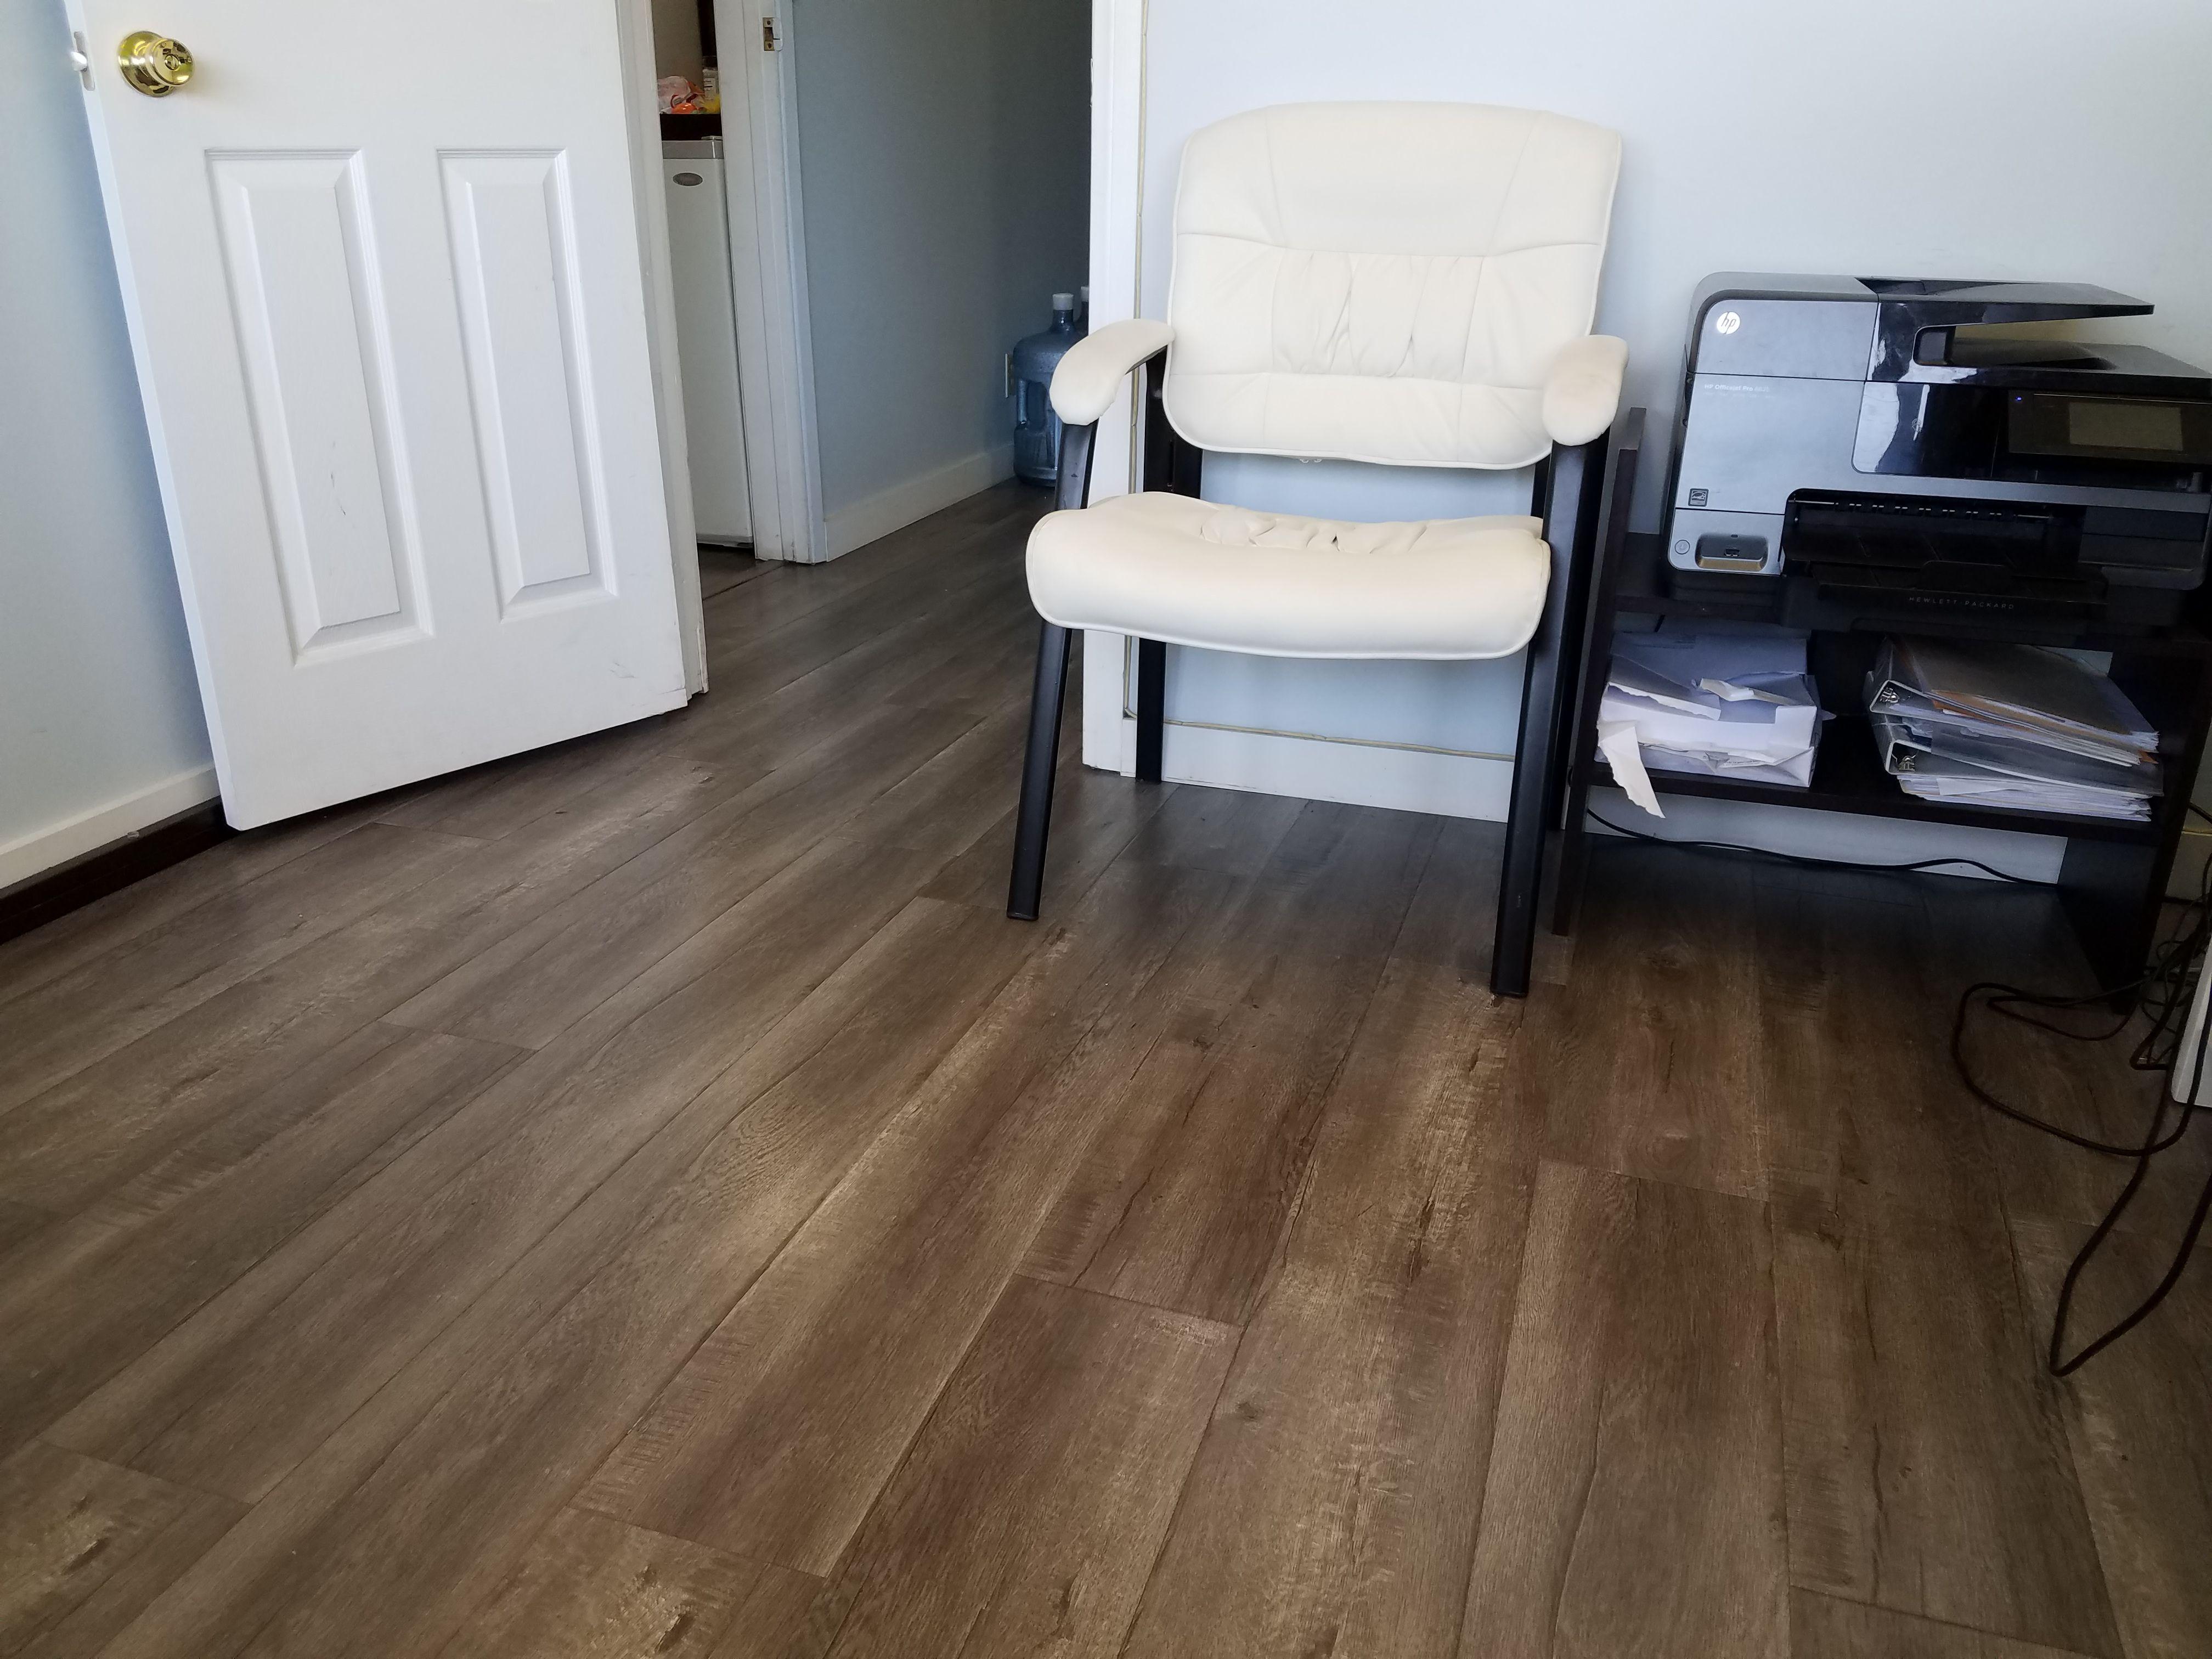 product wide floors fmh beachside beaside laminate market evp plank flooring oak place